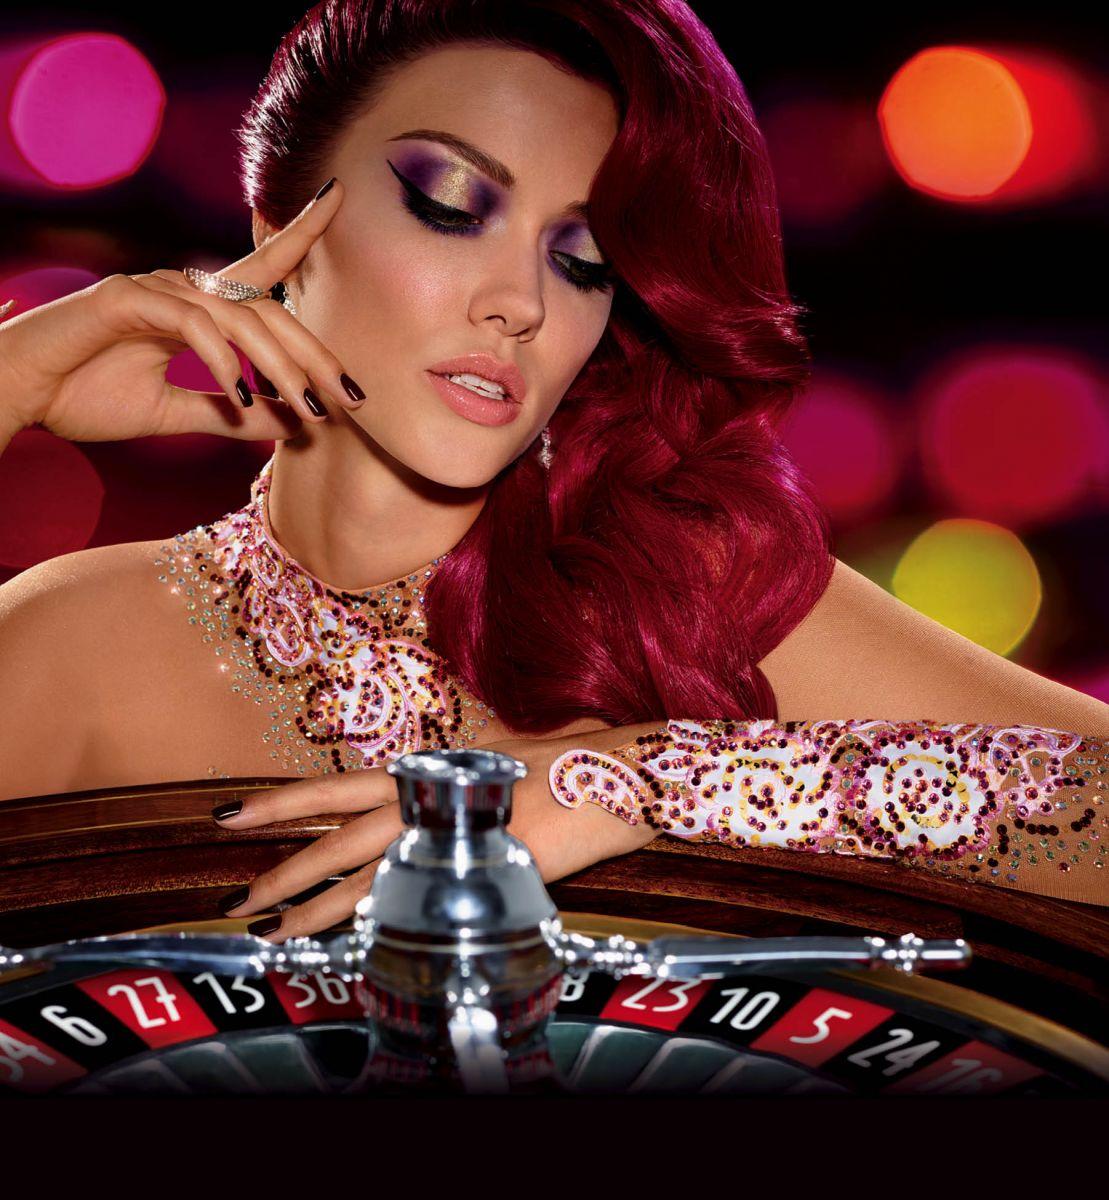 Огни Монте-Карло: новая коллекция Glam Roulette от Make up Factory